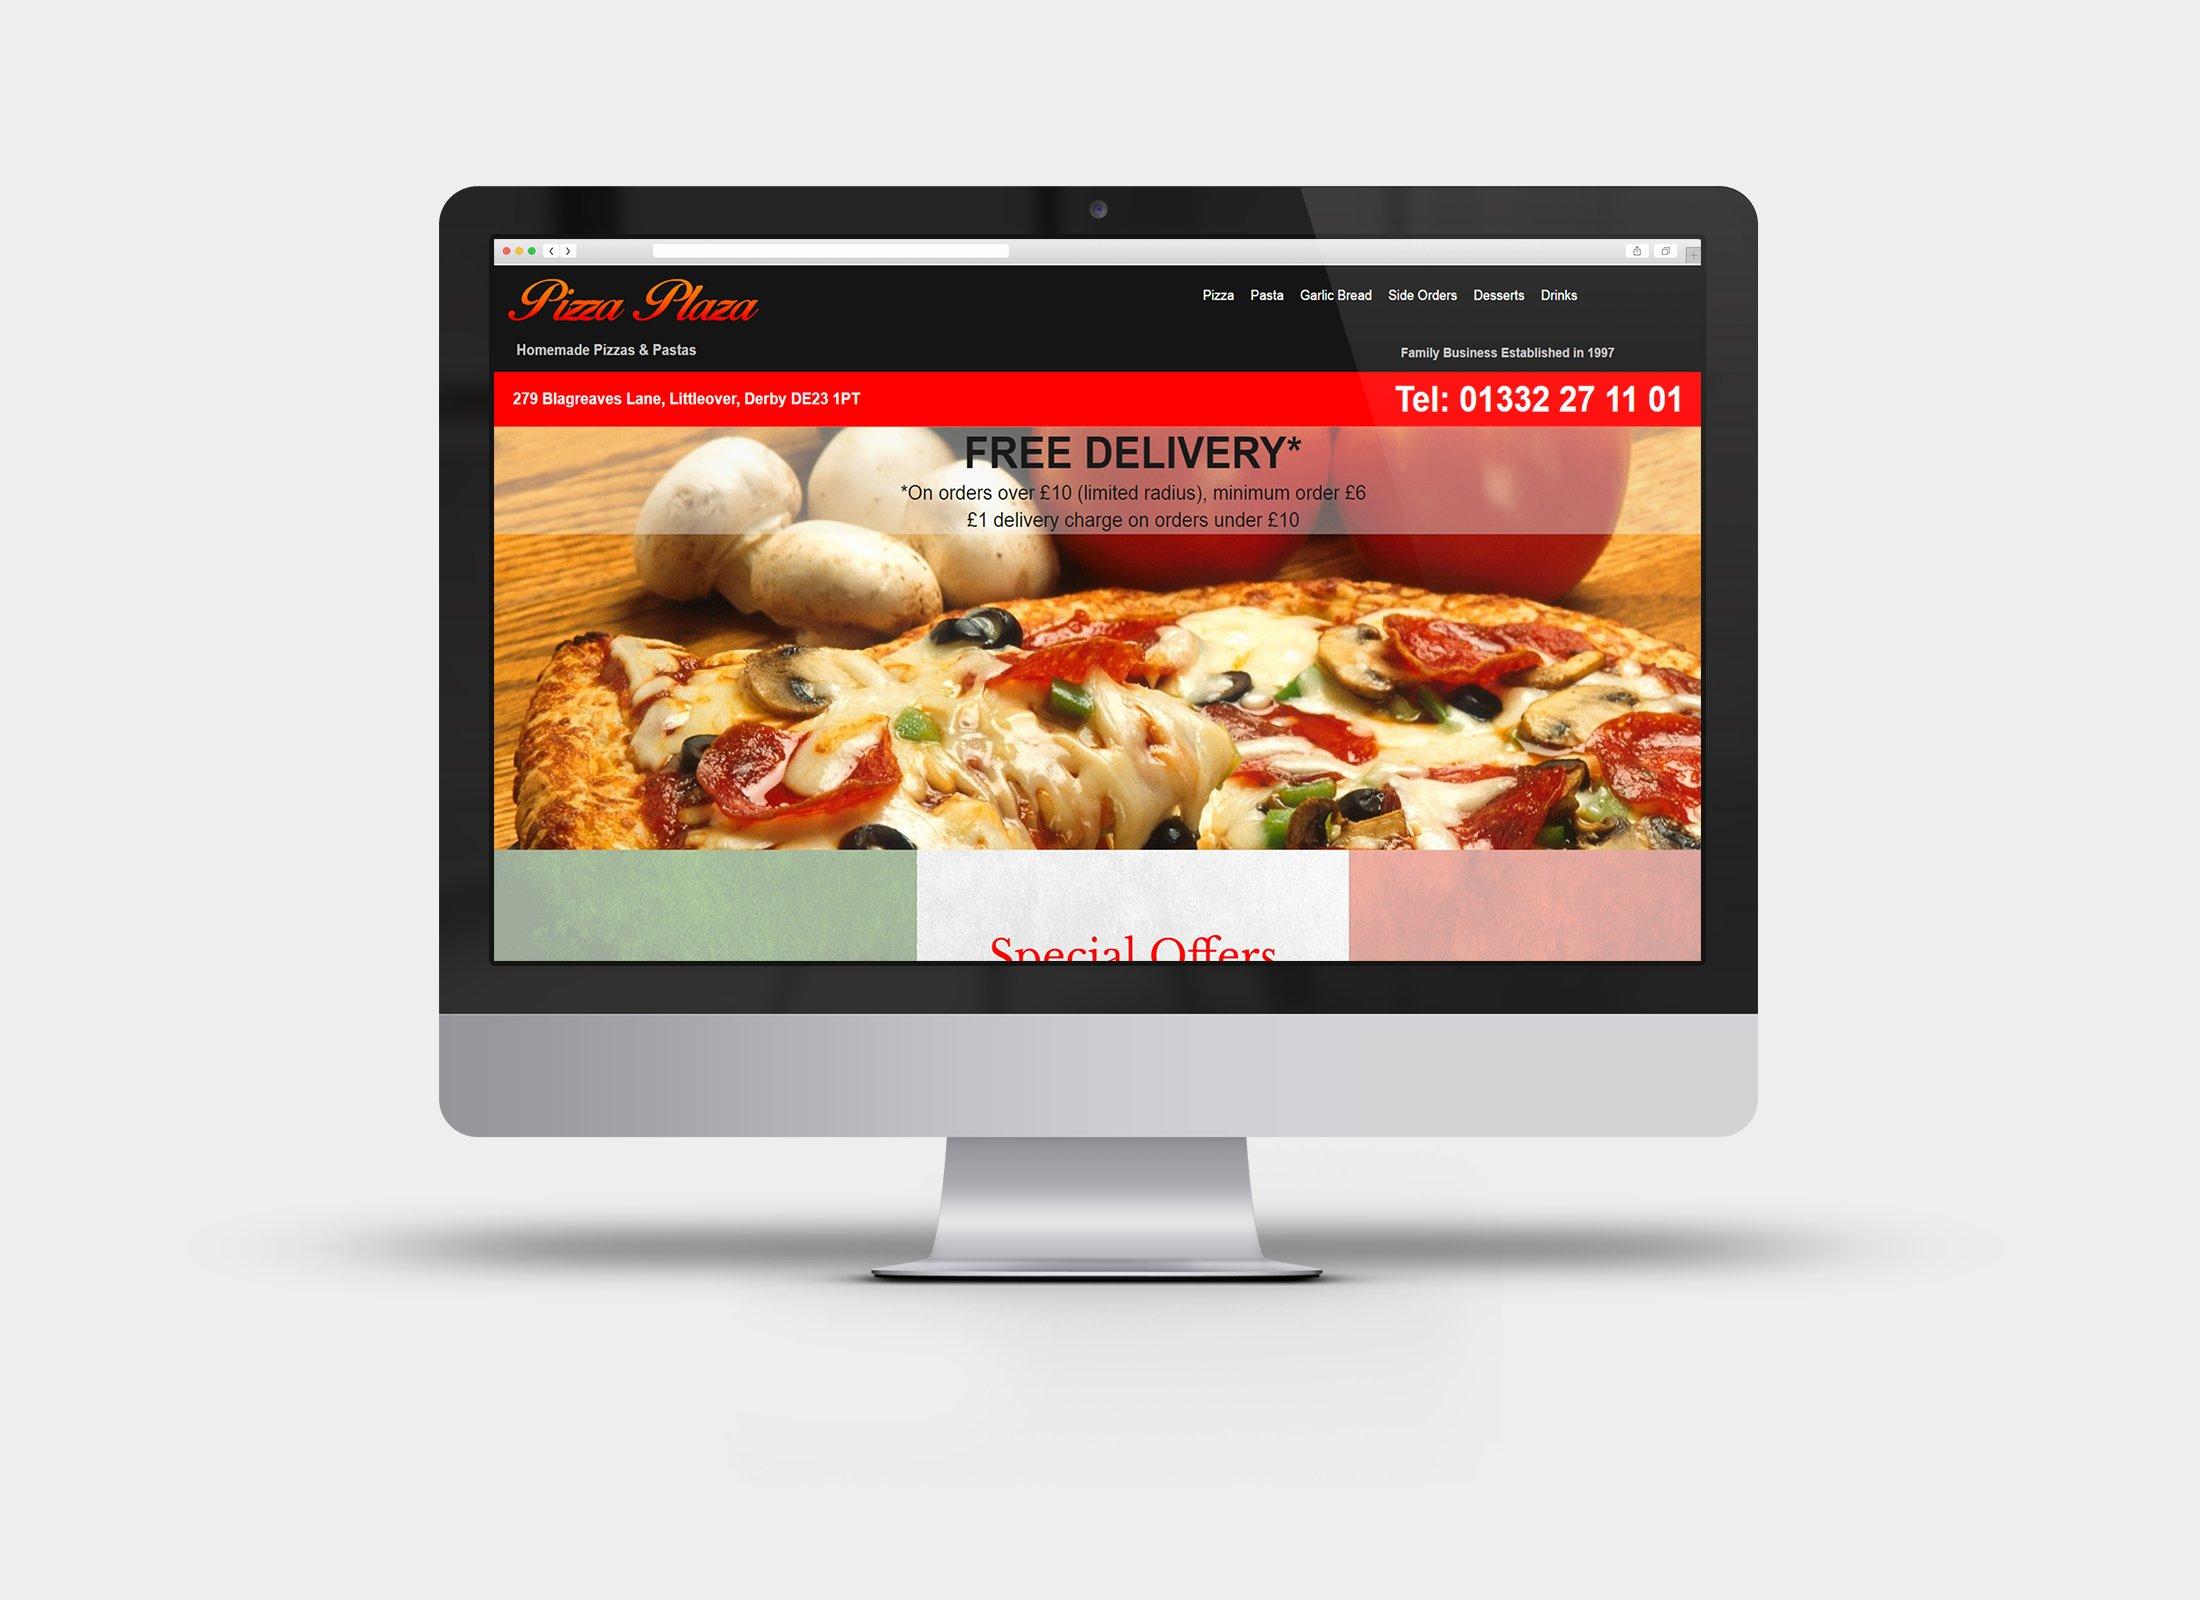 Pizza Plaza Derby